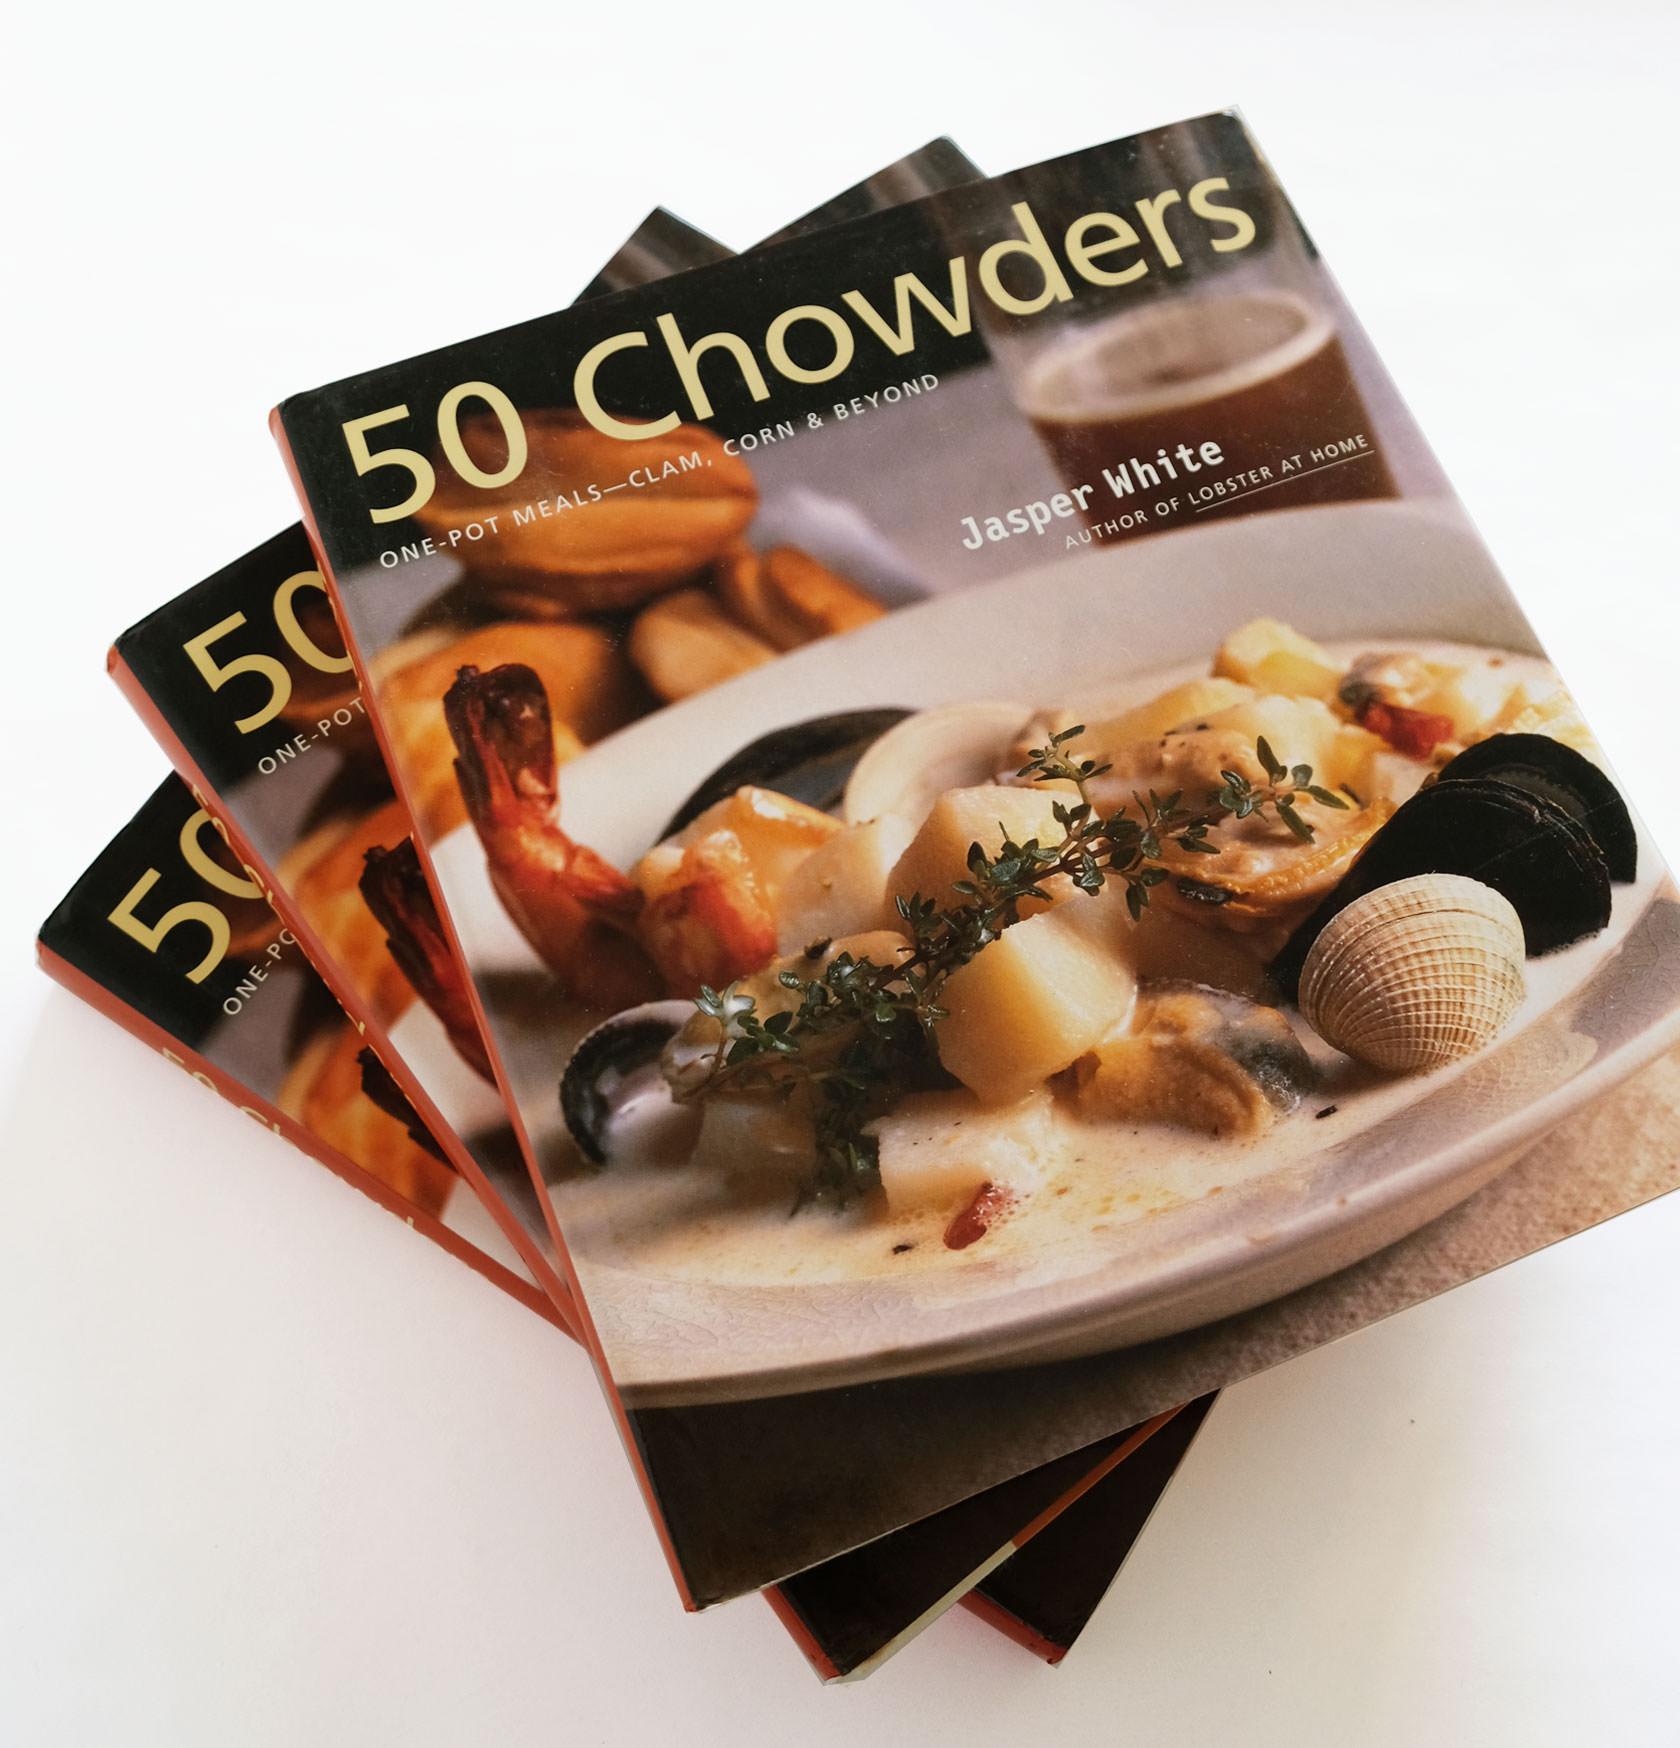 50chowders-jasperwhite-book-simonschuster-6